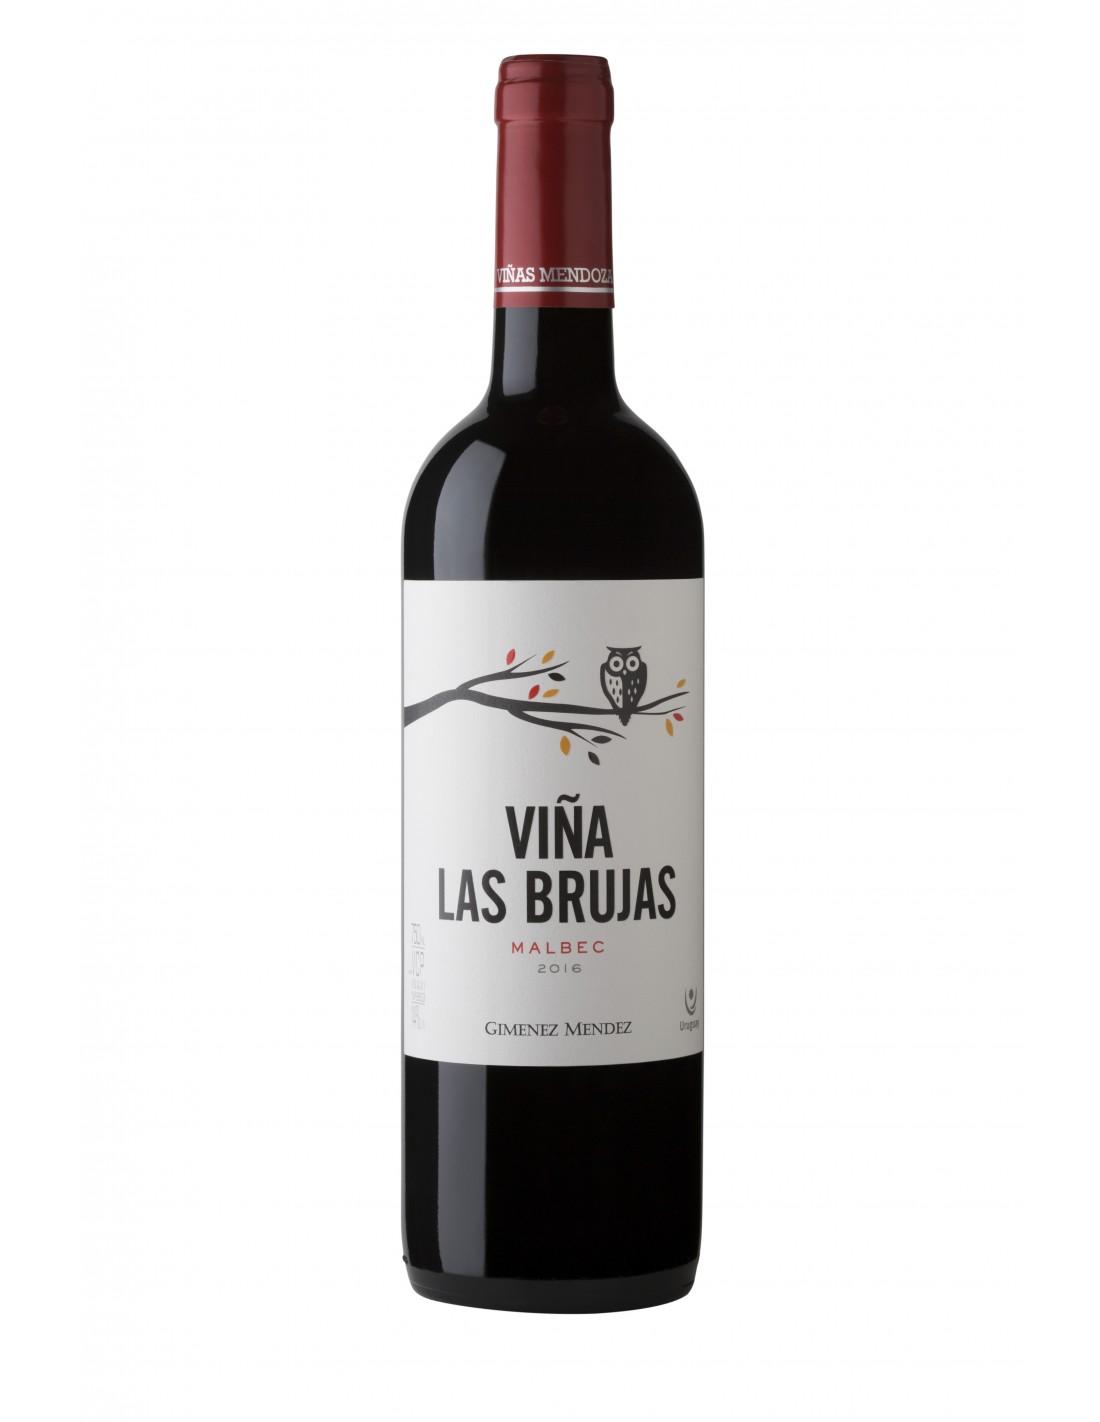 Vin roze, Malbec, Viña Las Brujas, Gimenez Mendez Canelones, 0.75L, 13% alc., Uruguay